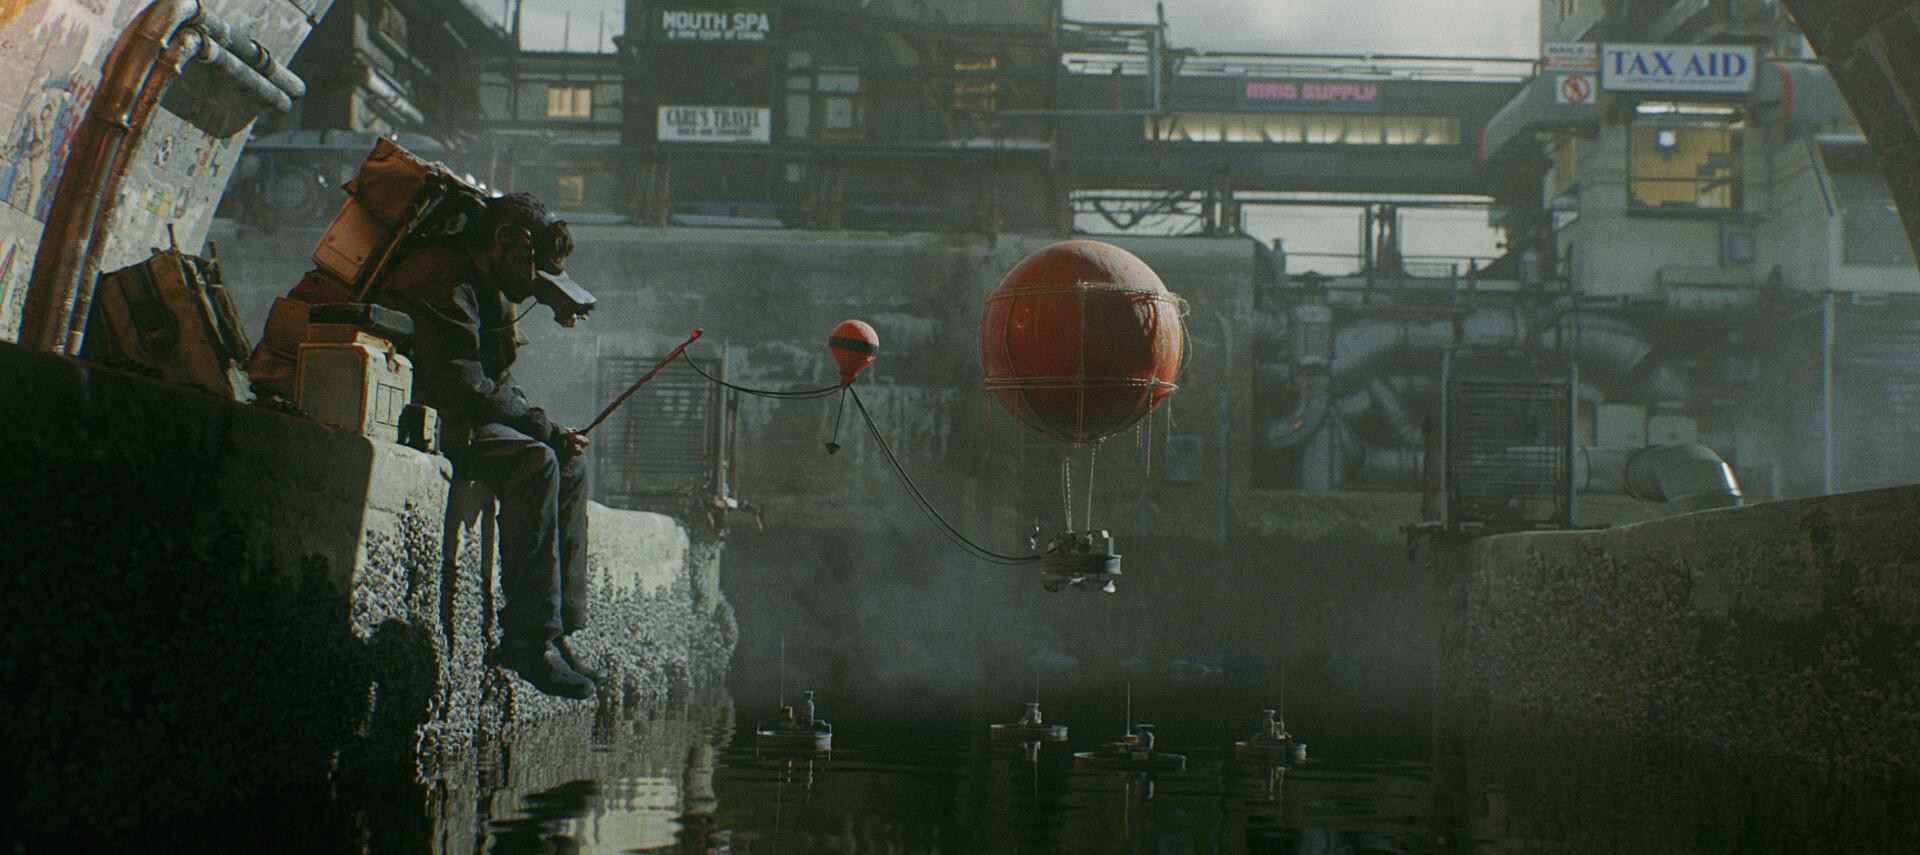 The Cinematic Sci-Fi Art of Ian Hubert